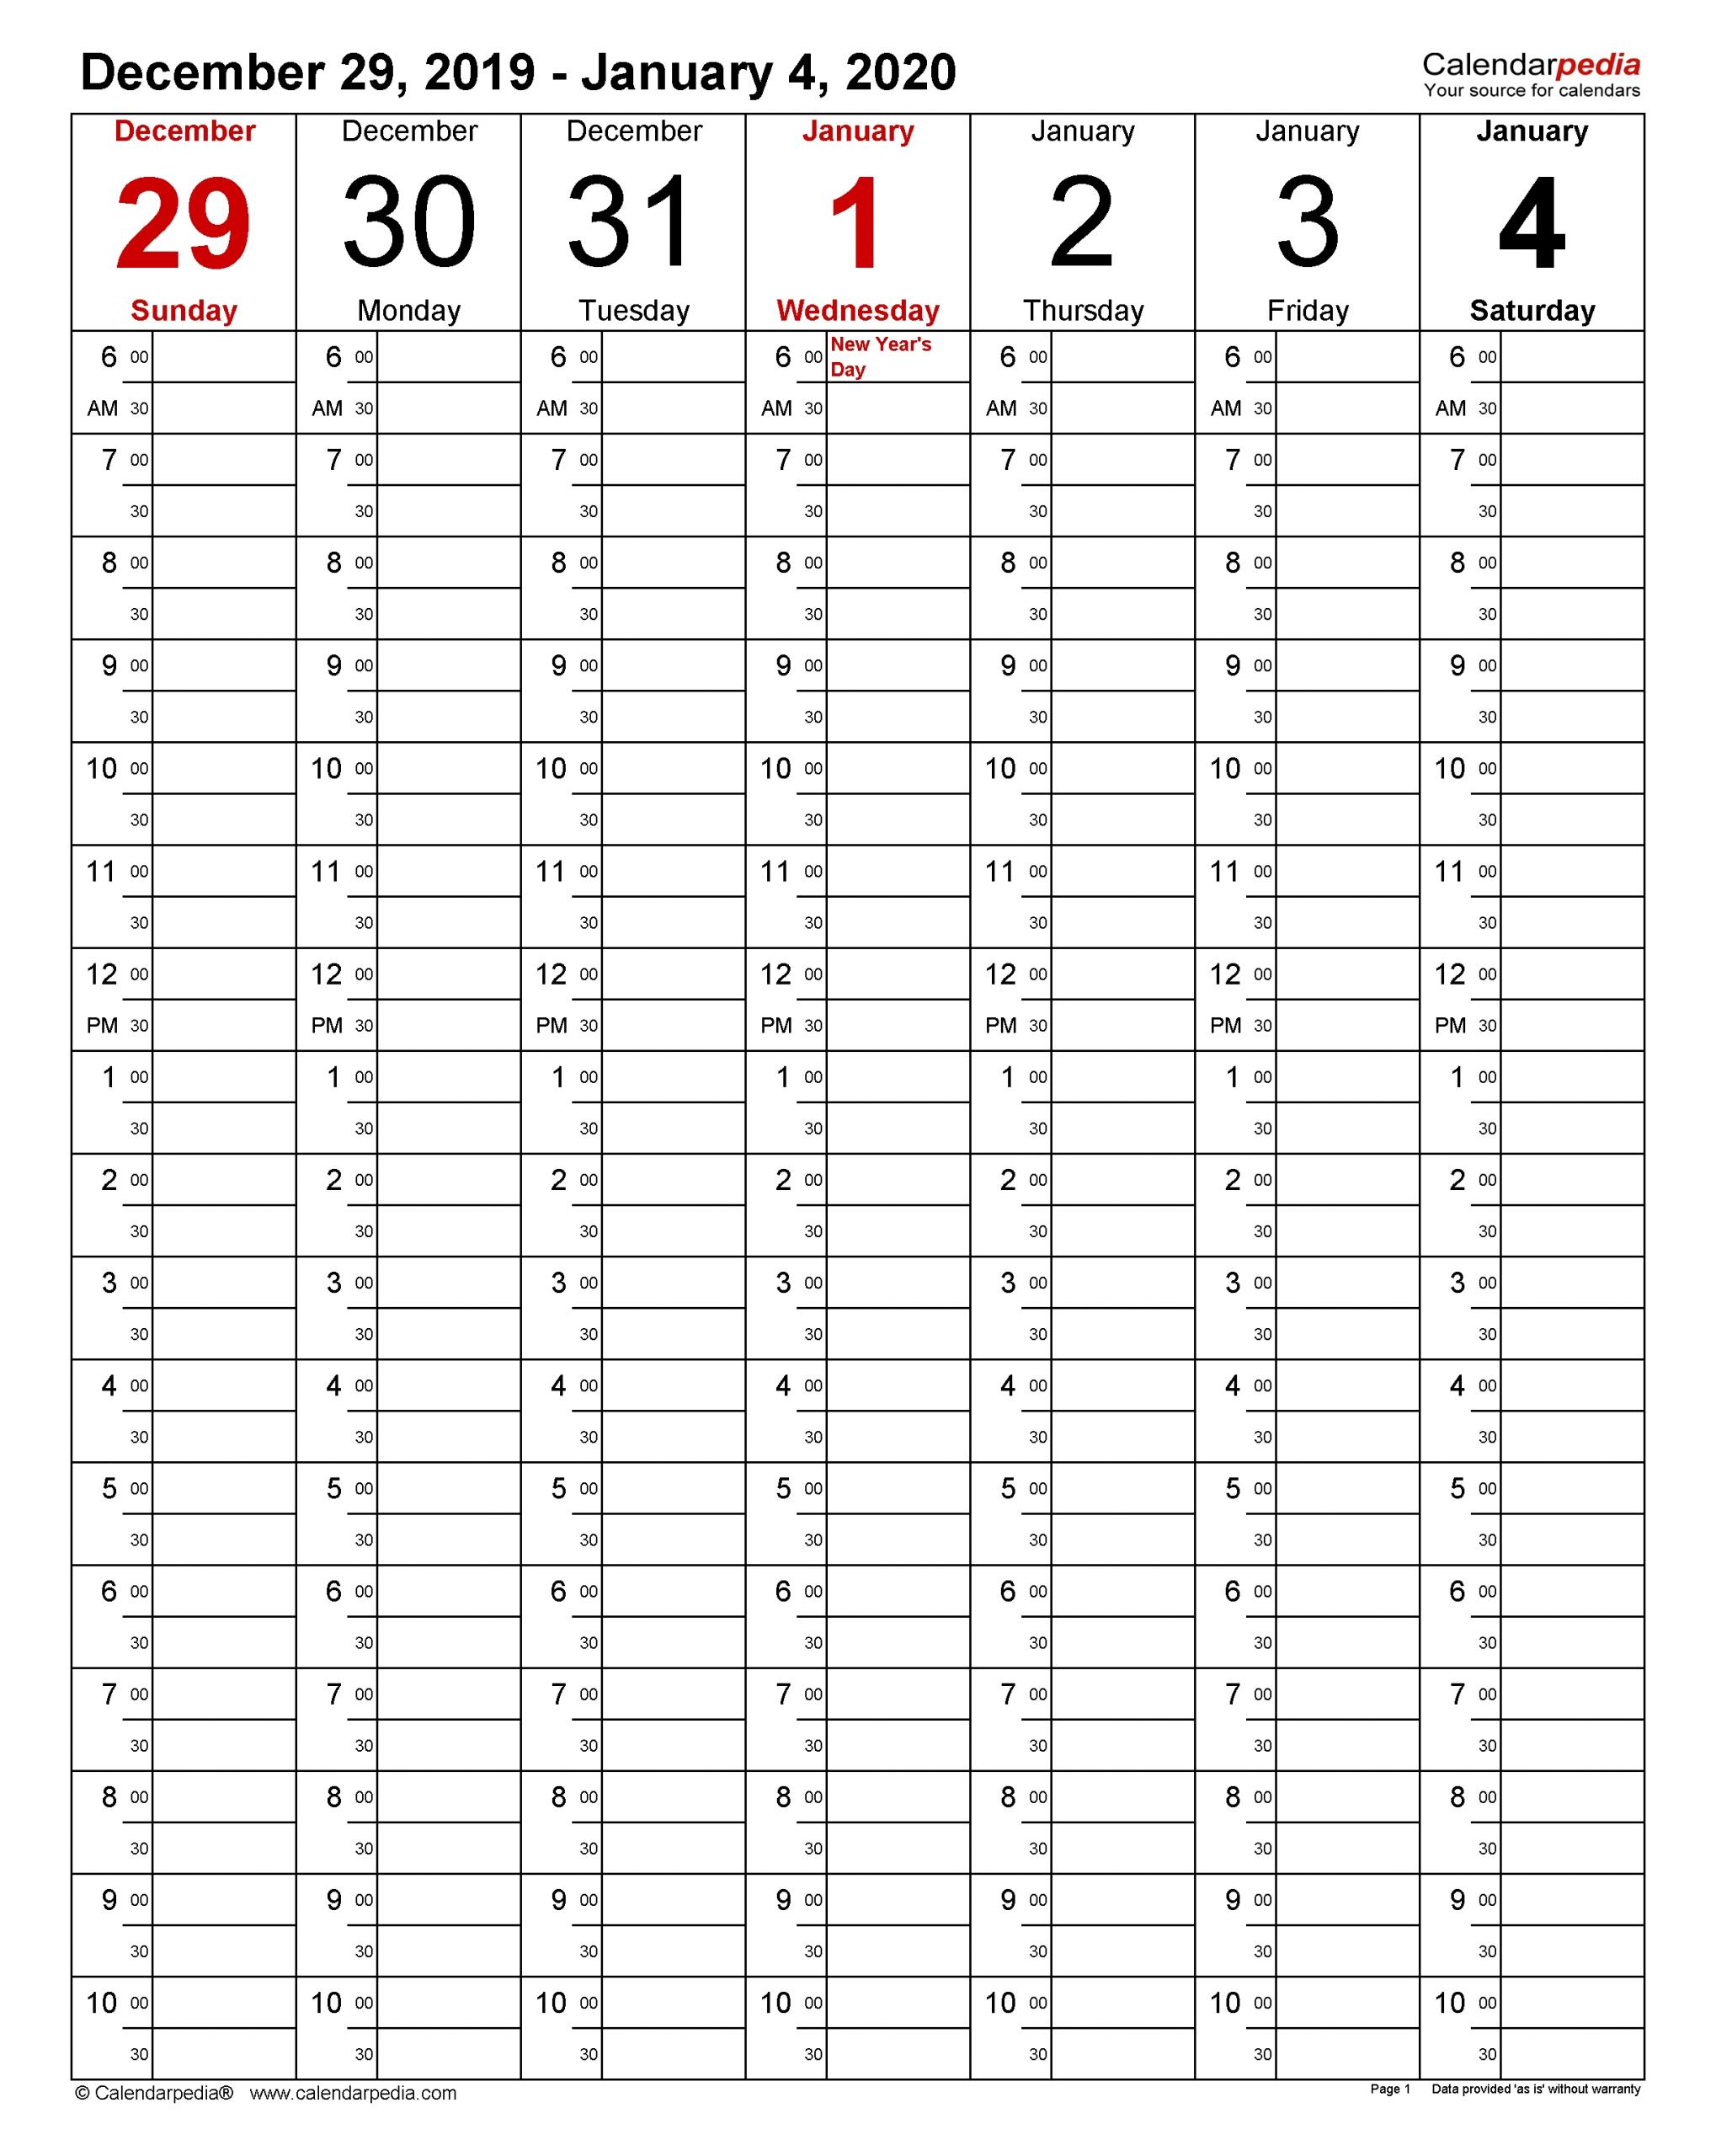 Weekly Calendars 2020 For Pdf - 12 Free Printable Templates inside 2020 Calender Year Week Wise